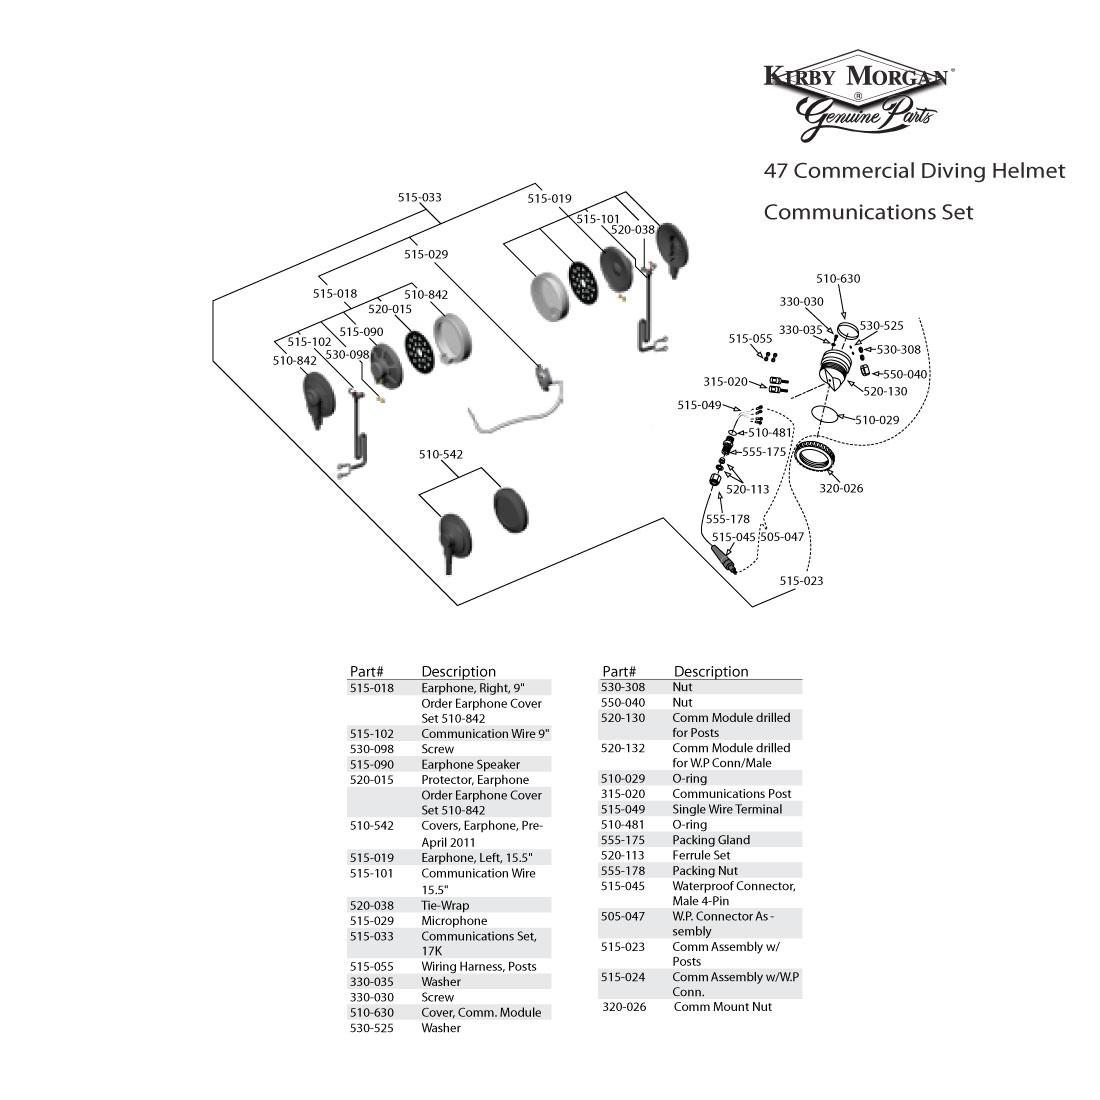 Kirby Morgan Wiring Diagram Trusted Diagrams G6 47 Commercial Diving Helmet Mwp 500 071 Regulator